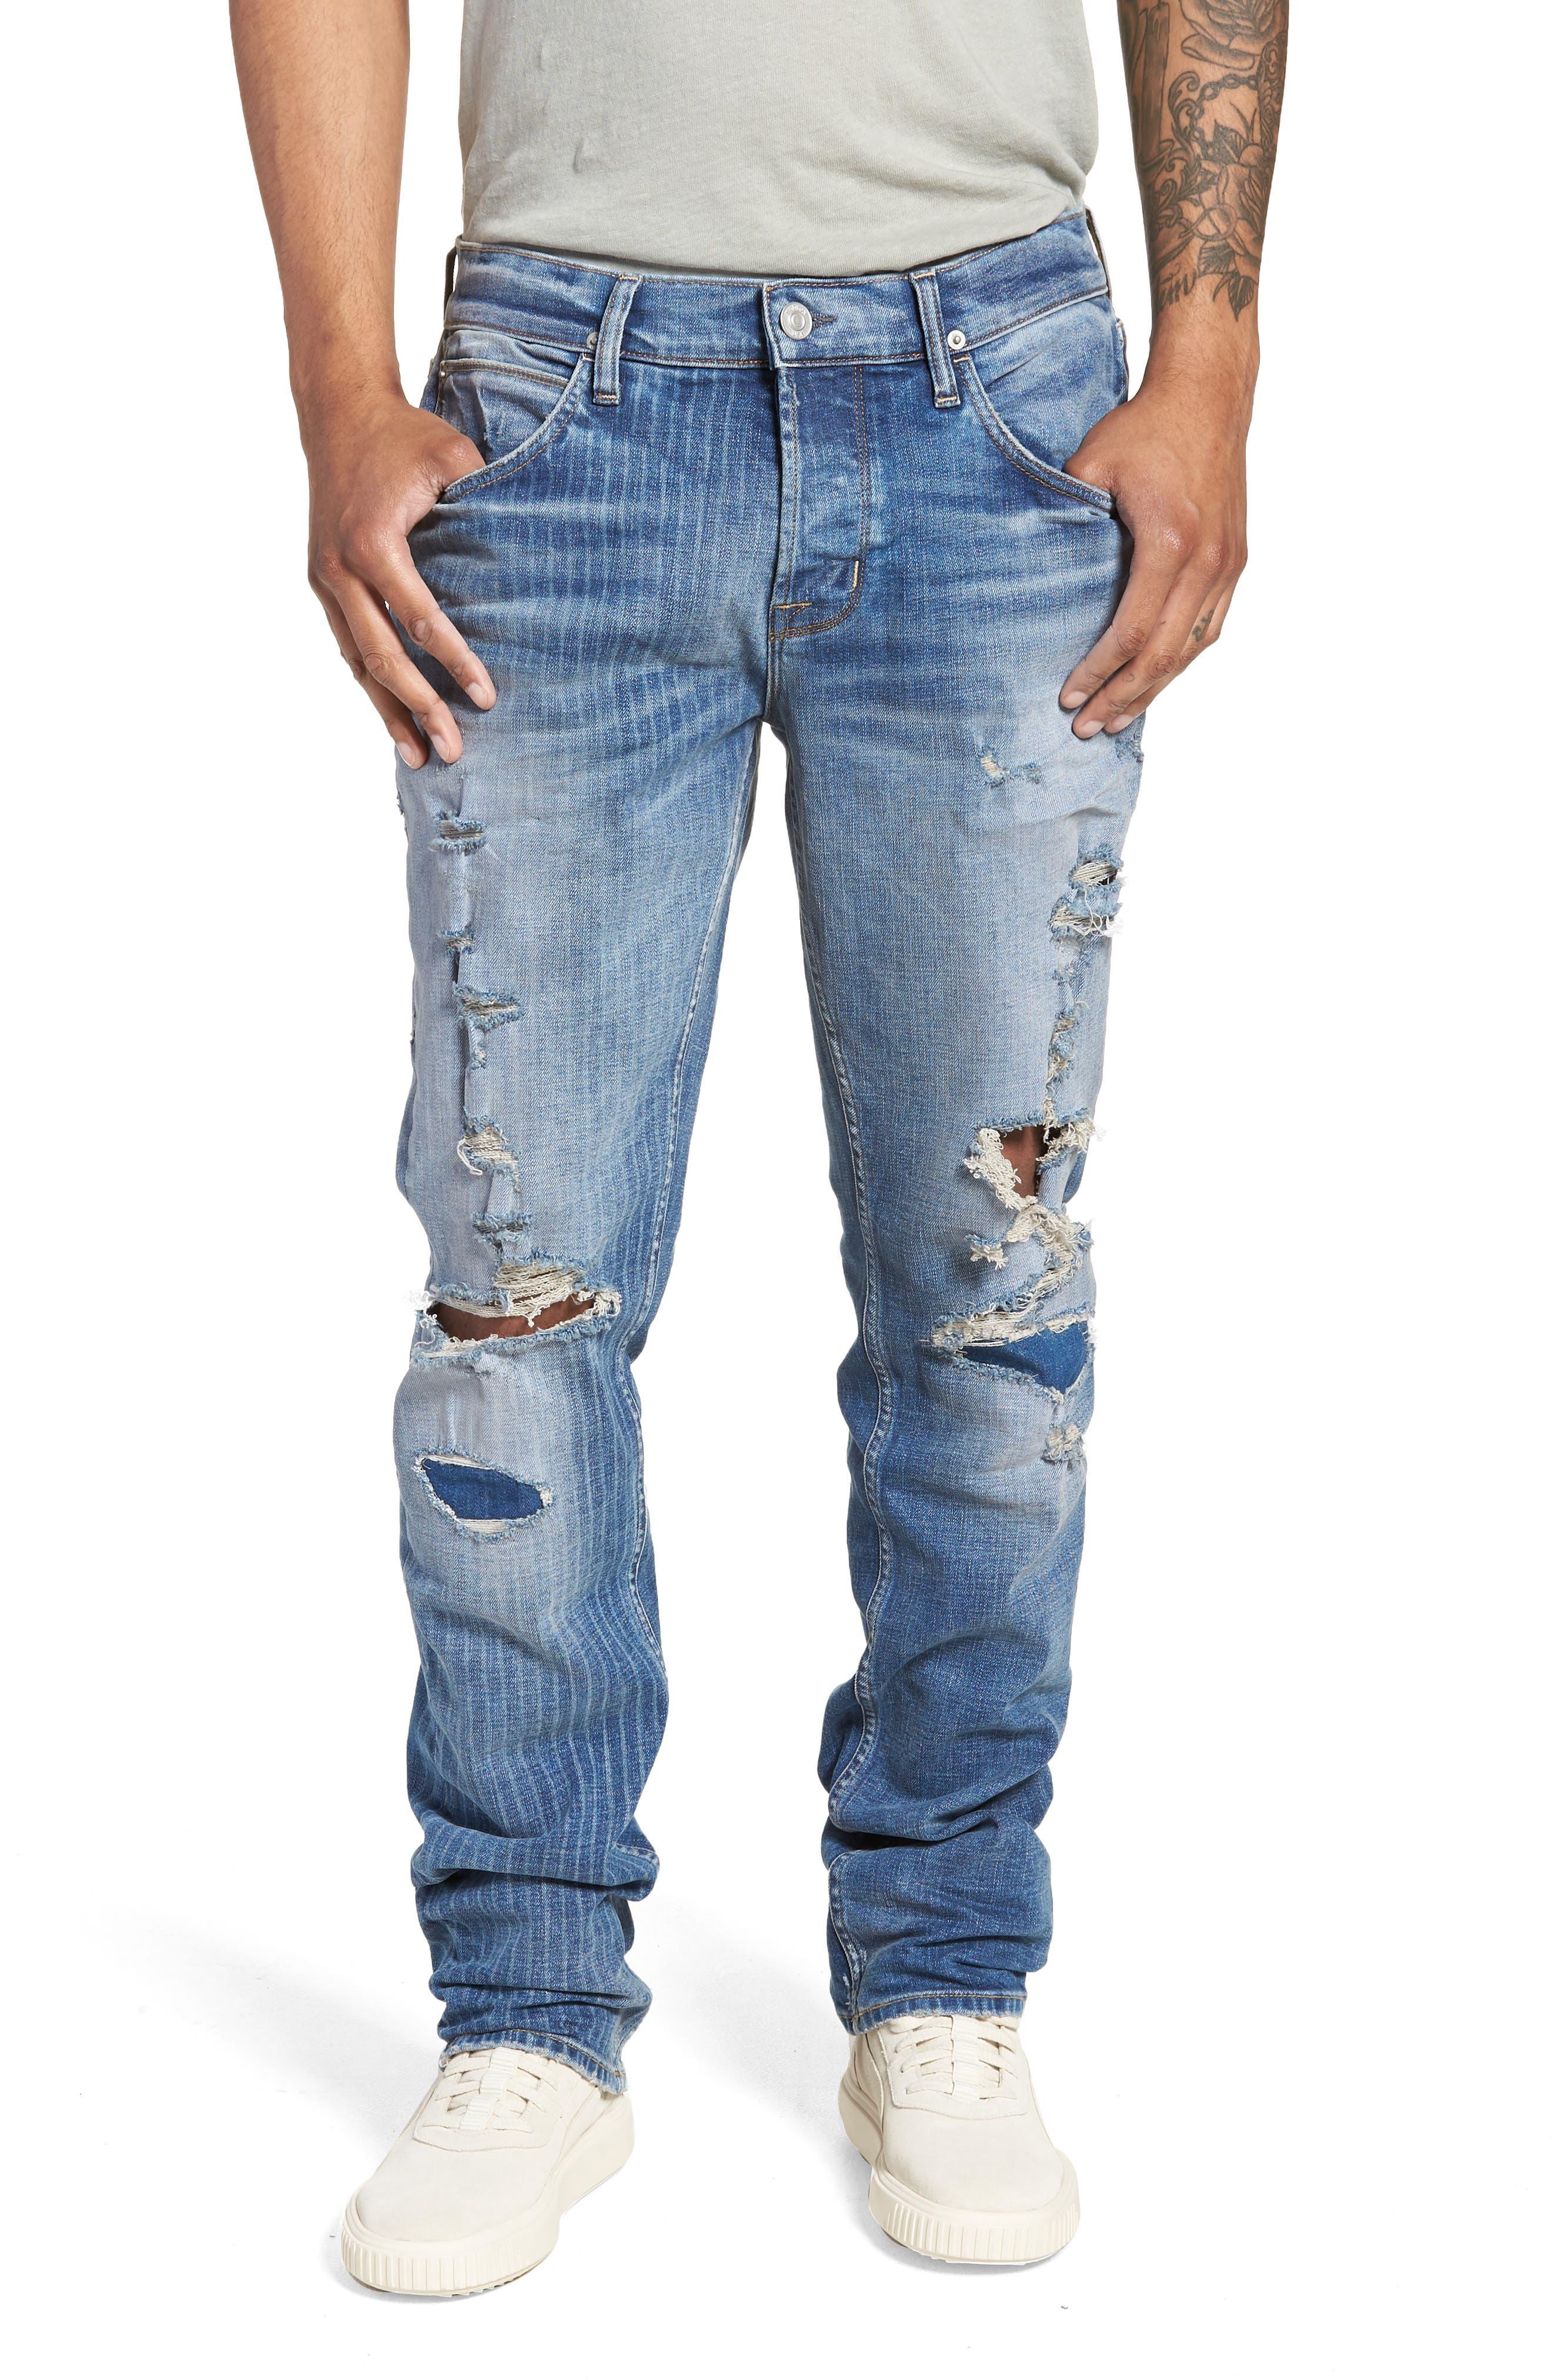 Blake Slim Fit Jeans,                             Main thumbnail 1, color,                             Eagle Rock